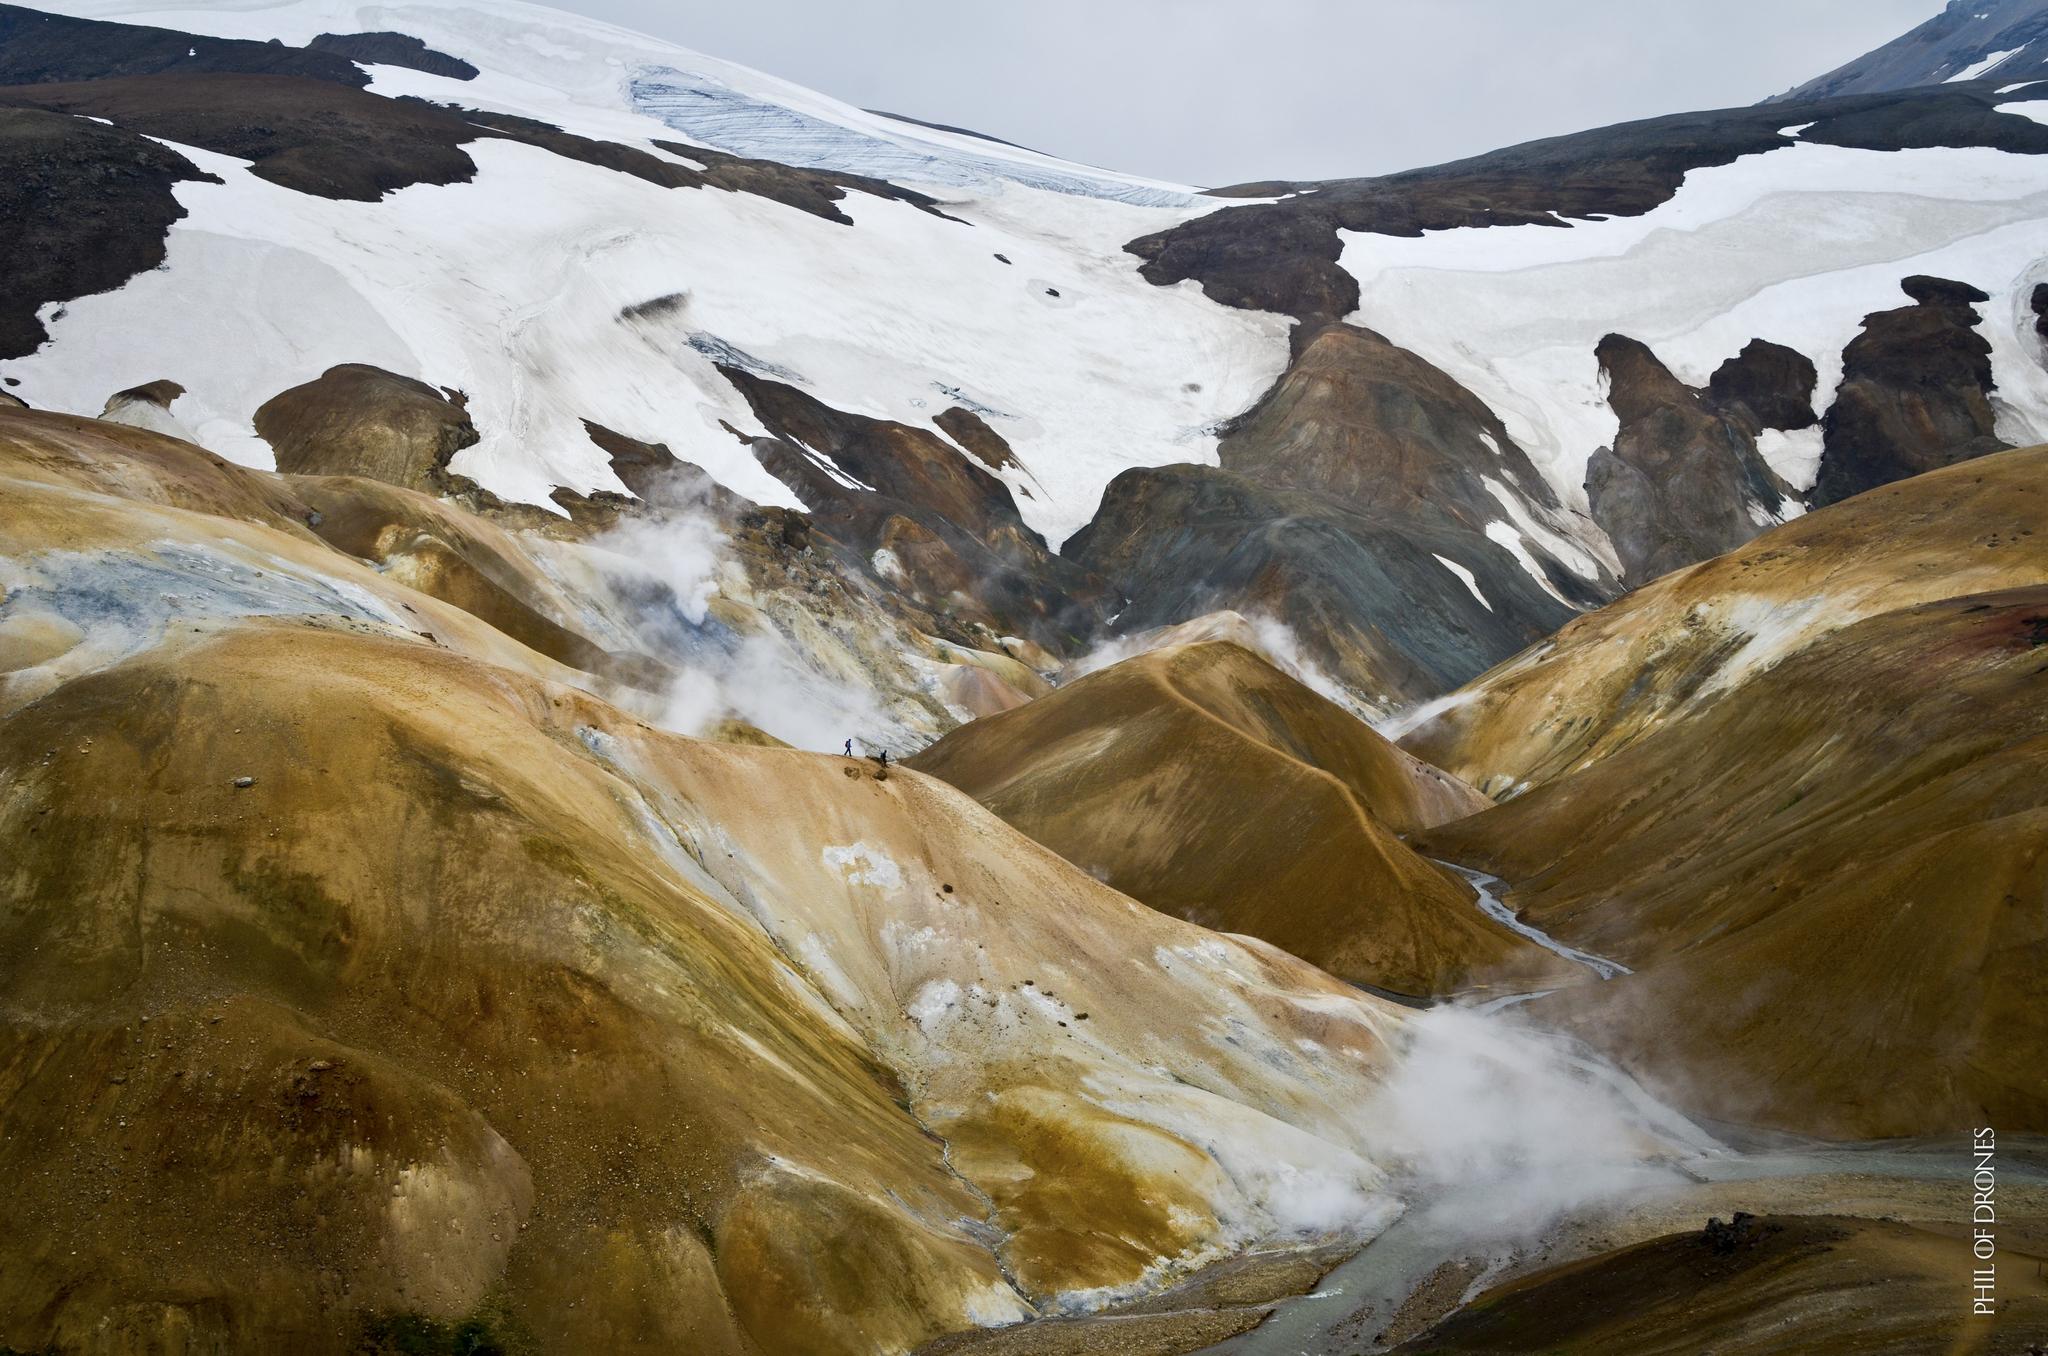 Islande 2013-3-PhM-2.jpg